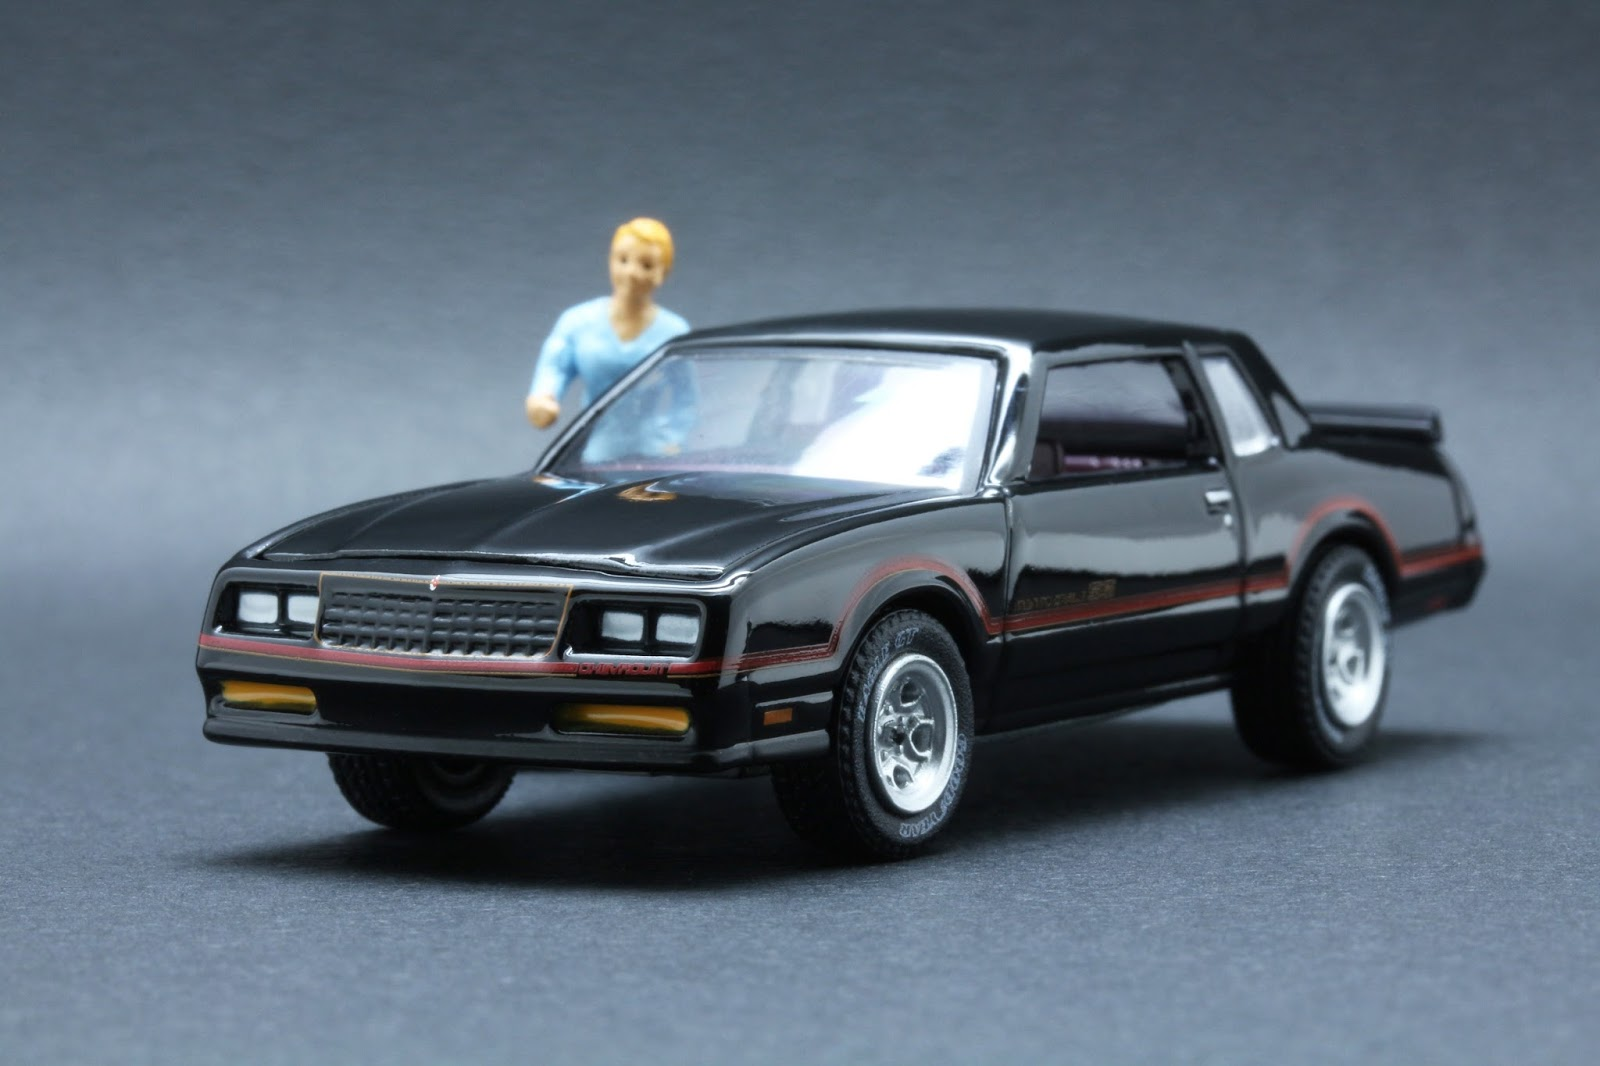 2016 Monte Carlo Ss >> Diecast Hobbist: 1985 Chevrolet Monte Carlo SS